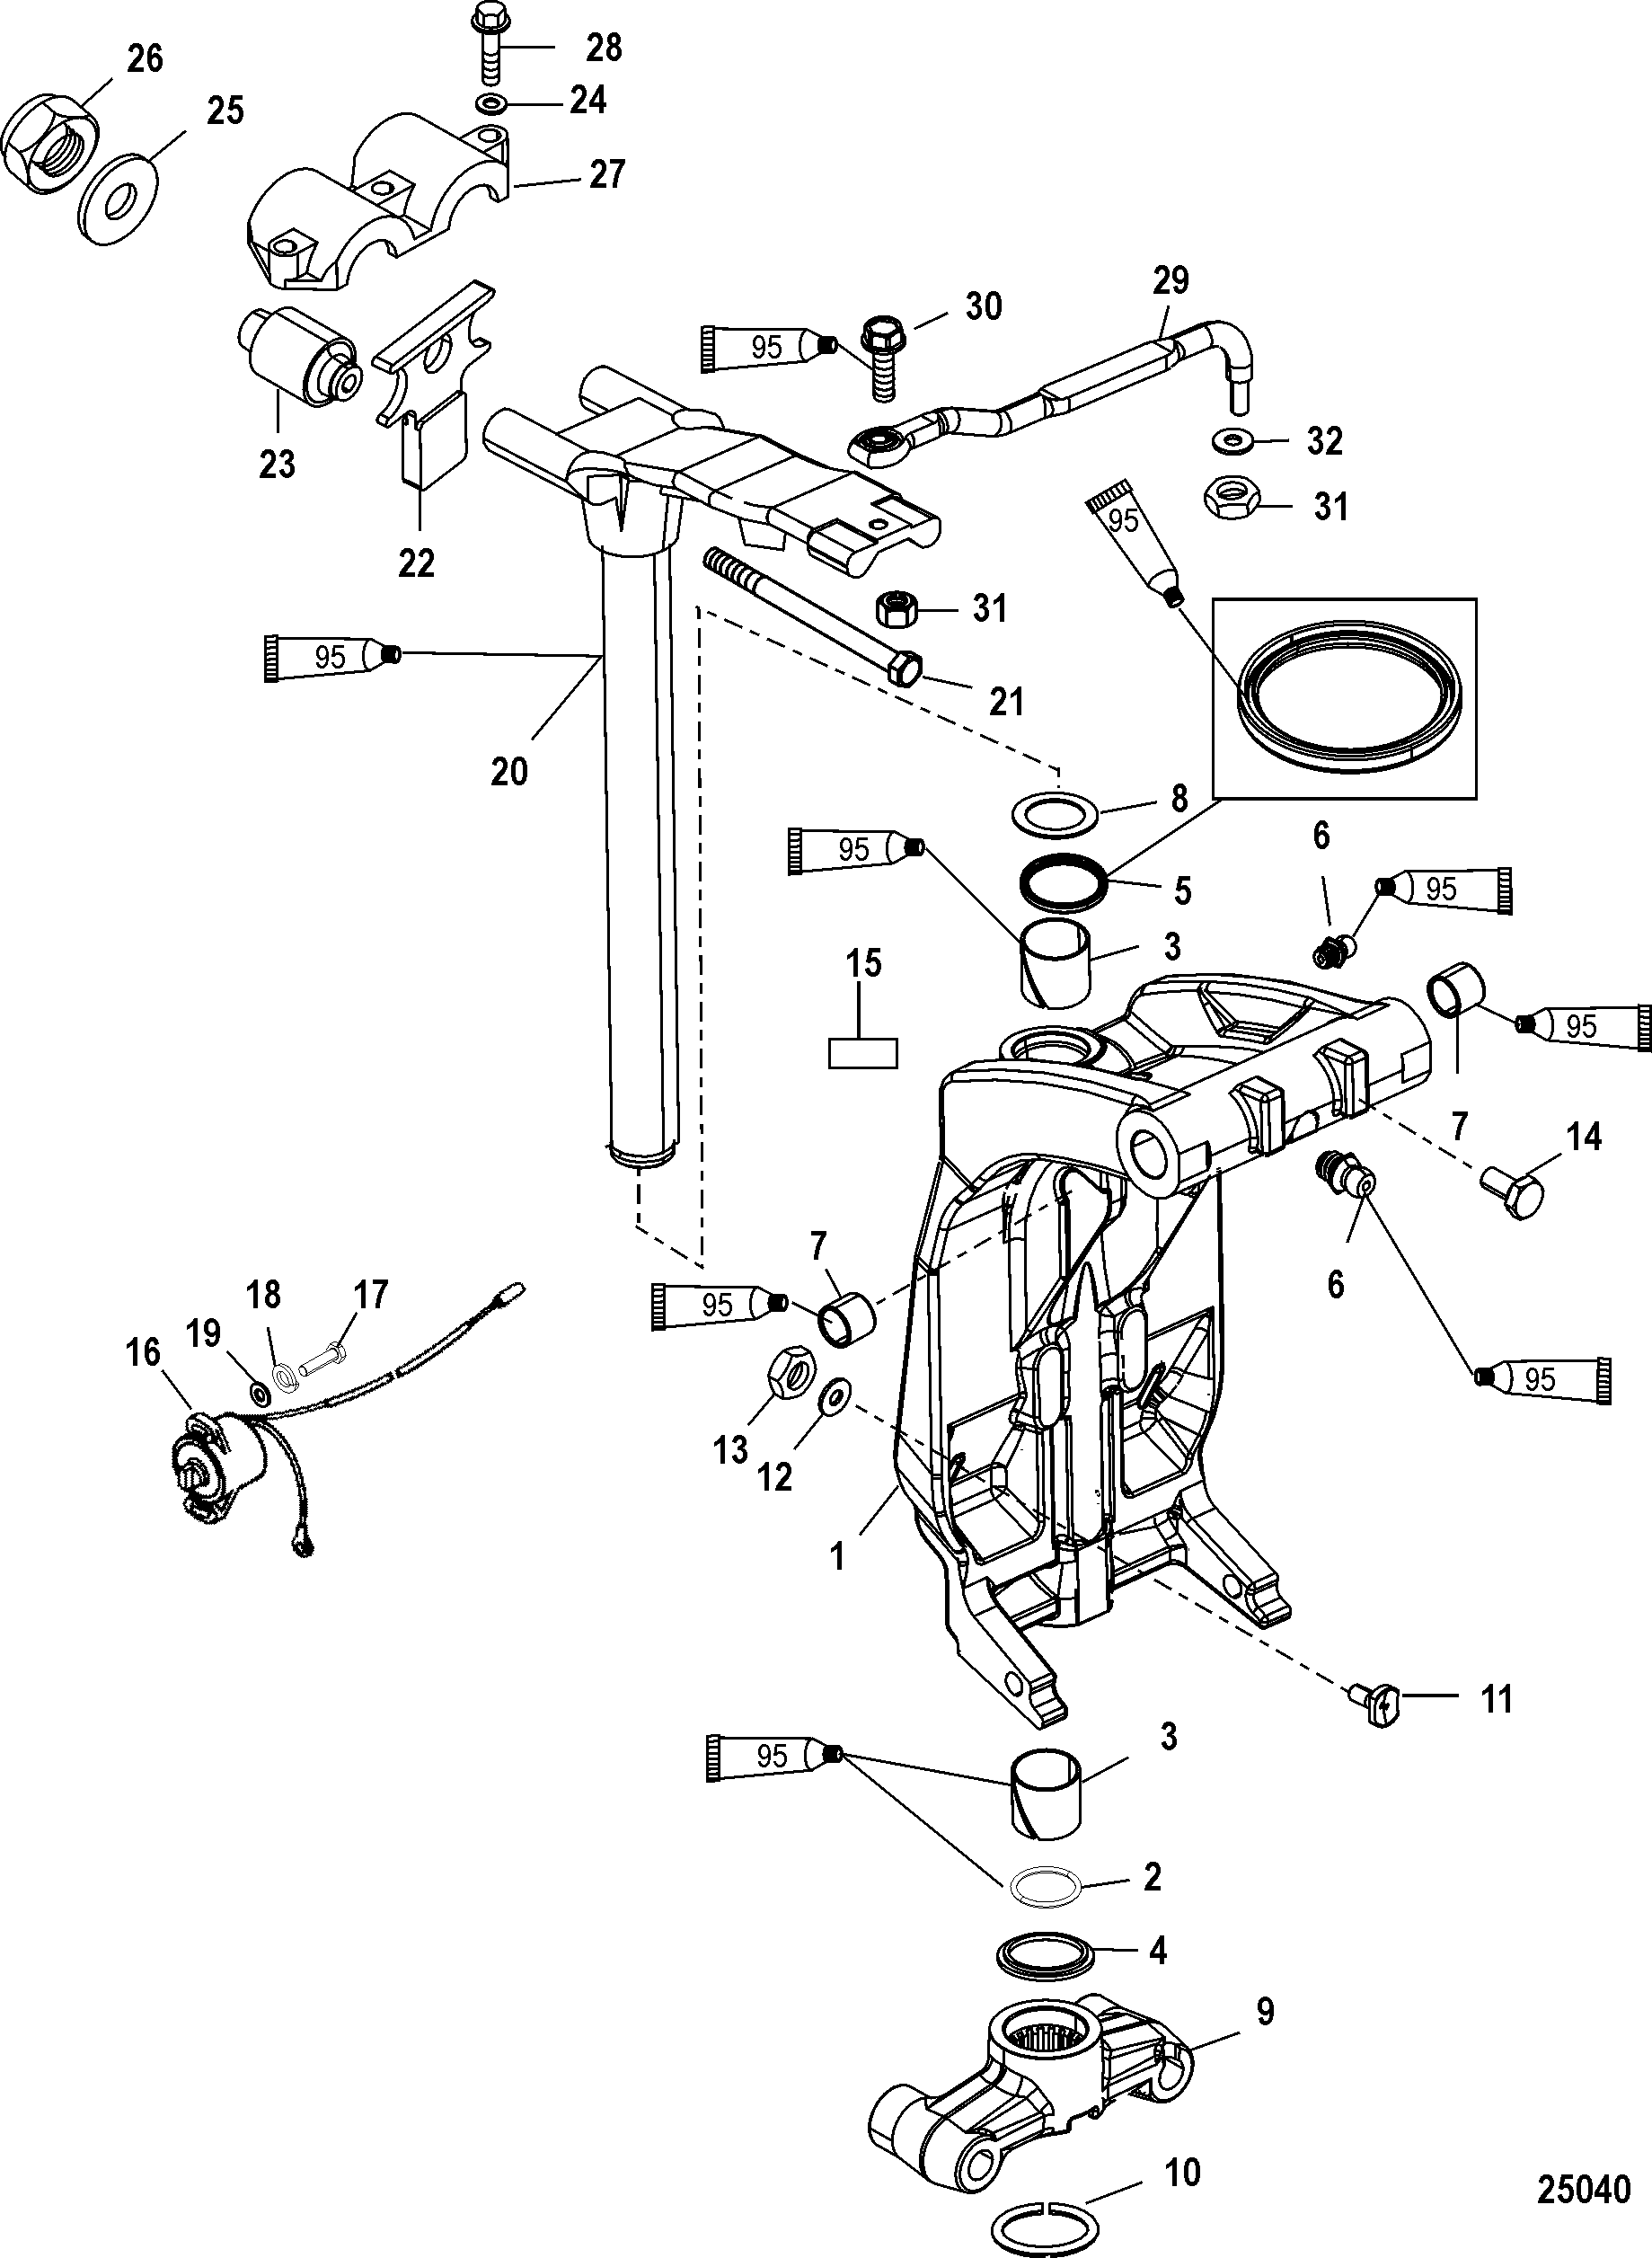 Swivel Bracket And Steering Arm For Mercury 250 Pro Xs 3 0l